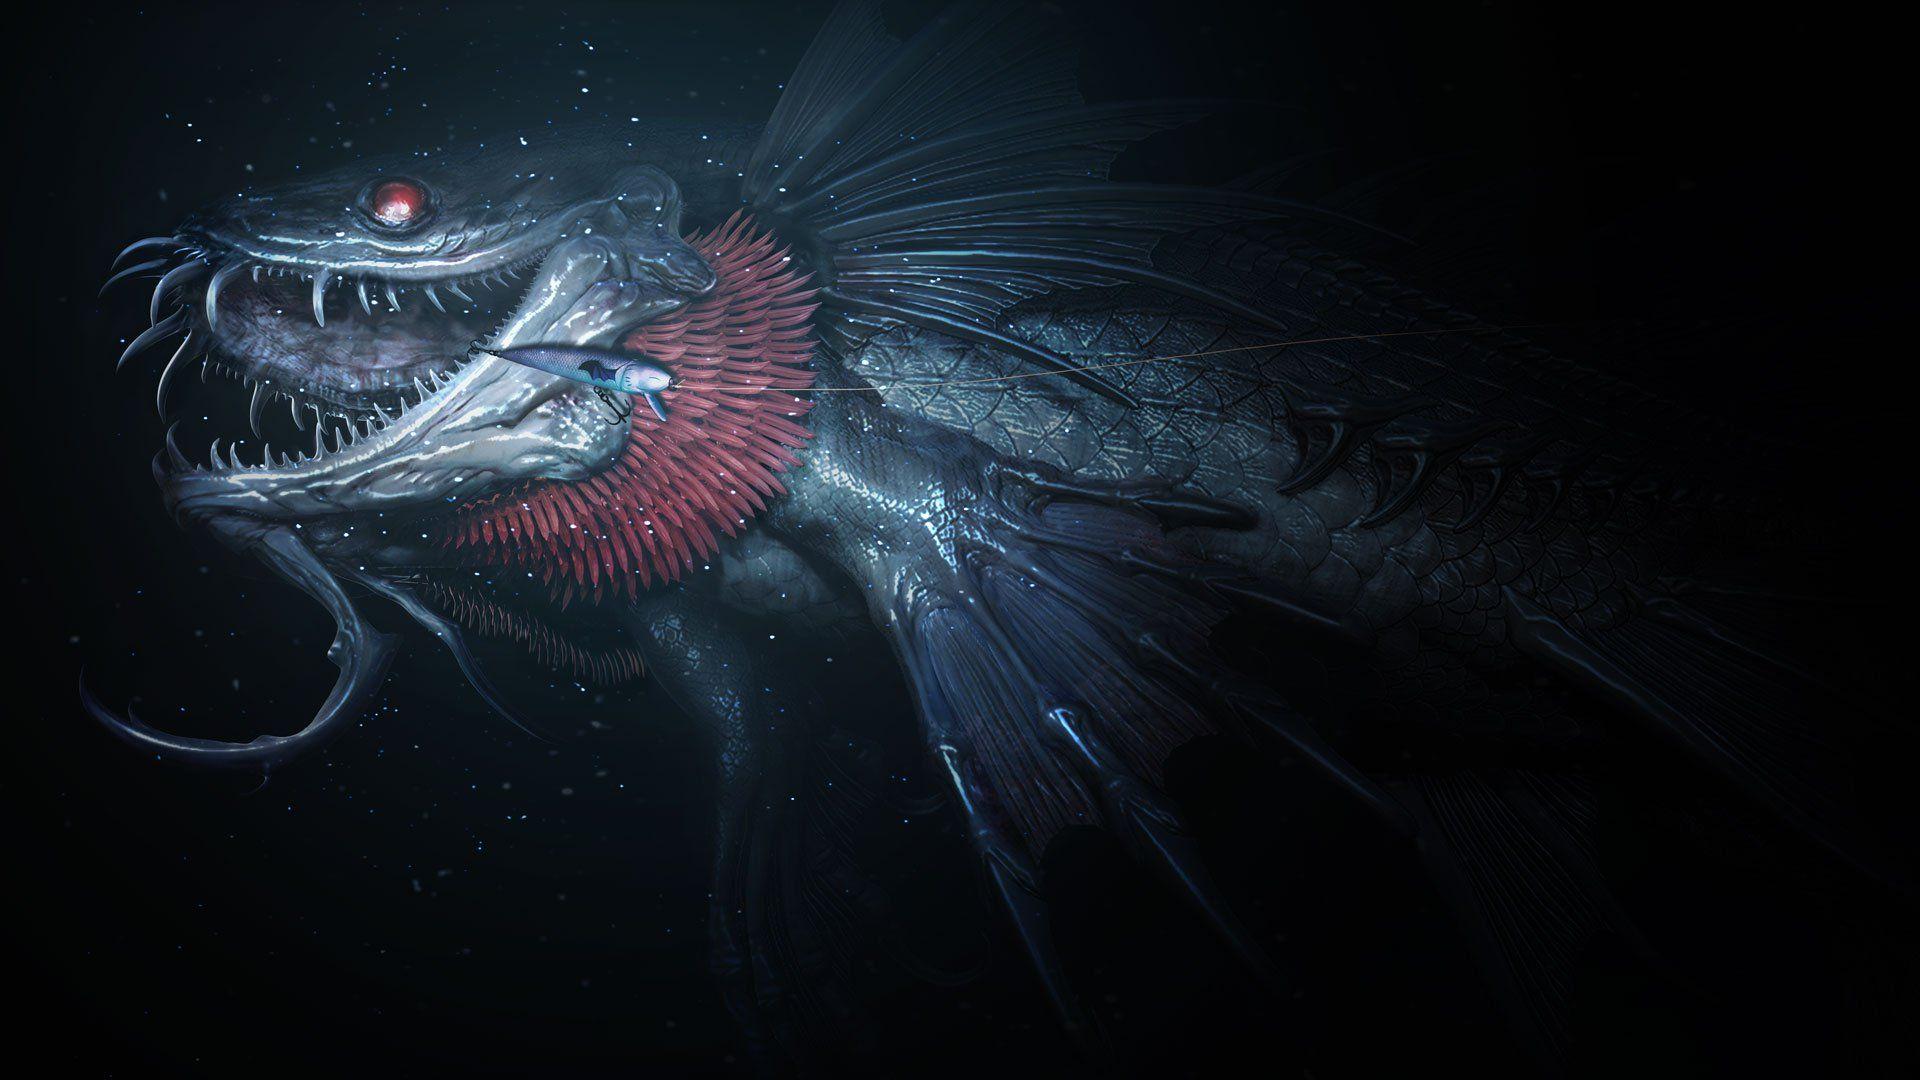 Monsters Of The Deep Final Fantasy Xv Final Fantasy Xv Monster Final Fantasy Monster of deep final fantasy xv